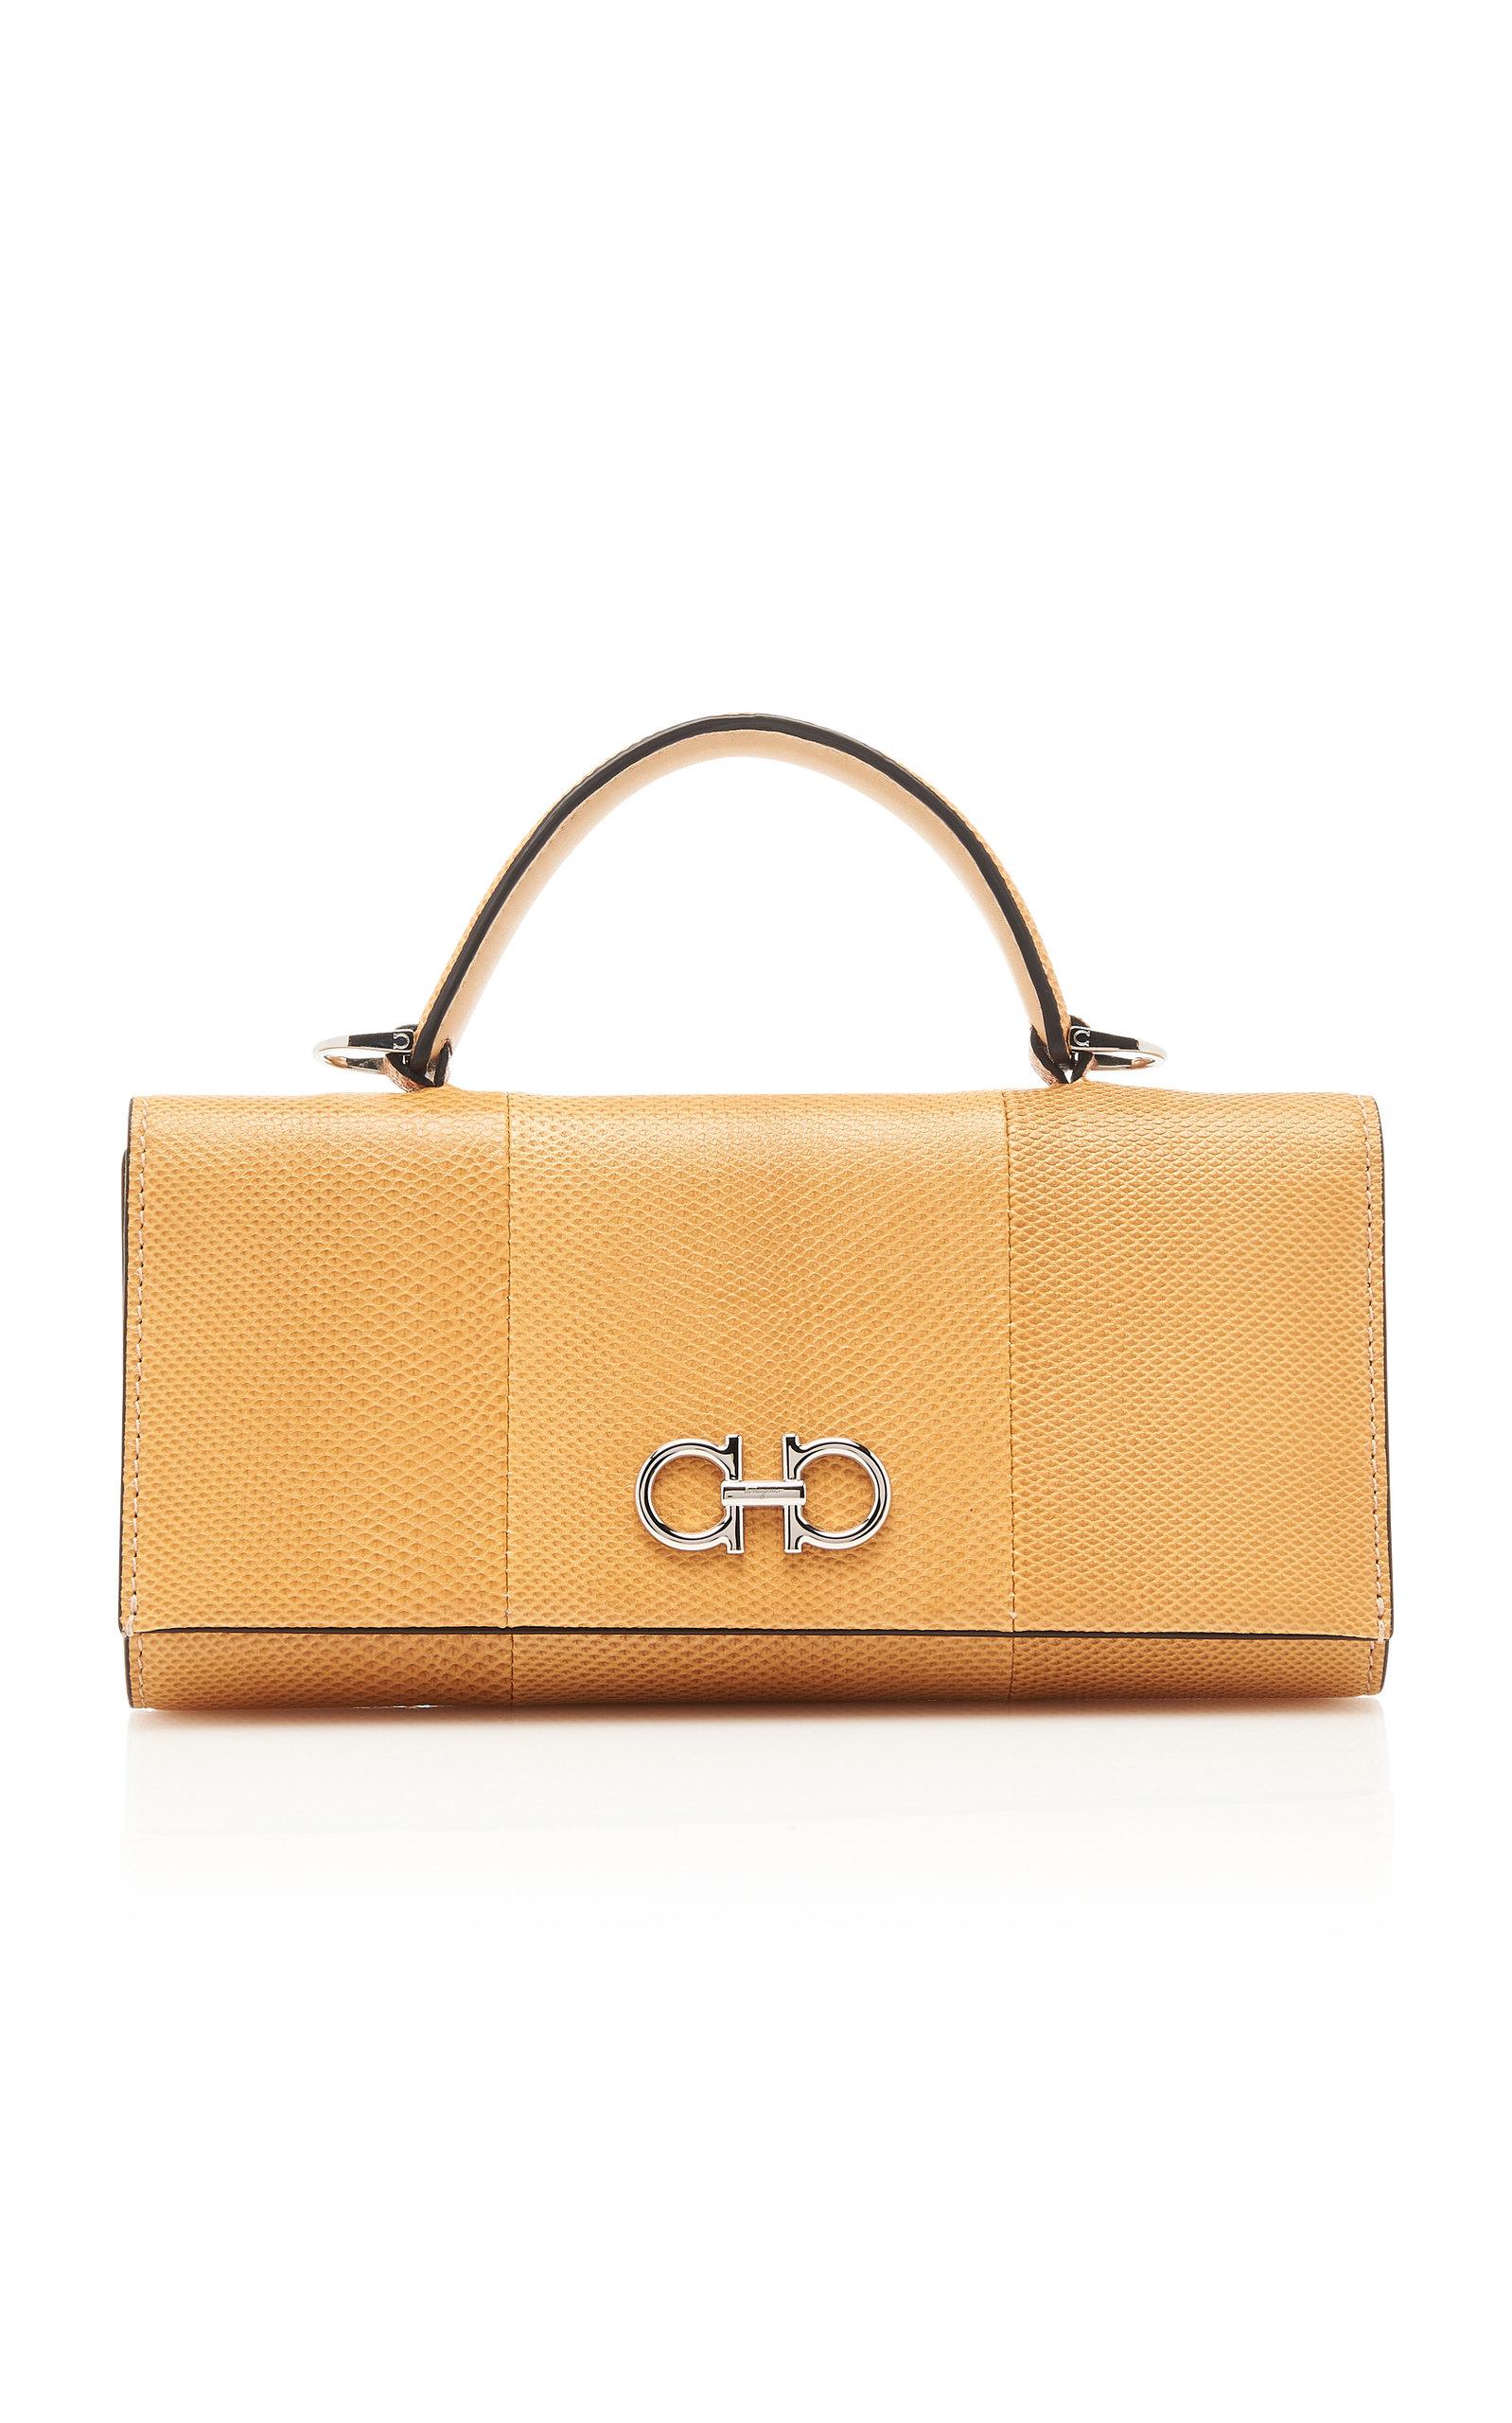 d02fc50aa8 Gancini Mini Karung Bag by Salvatore Ferragamo